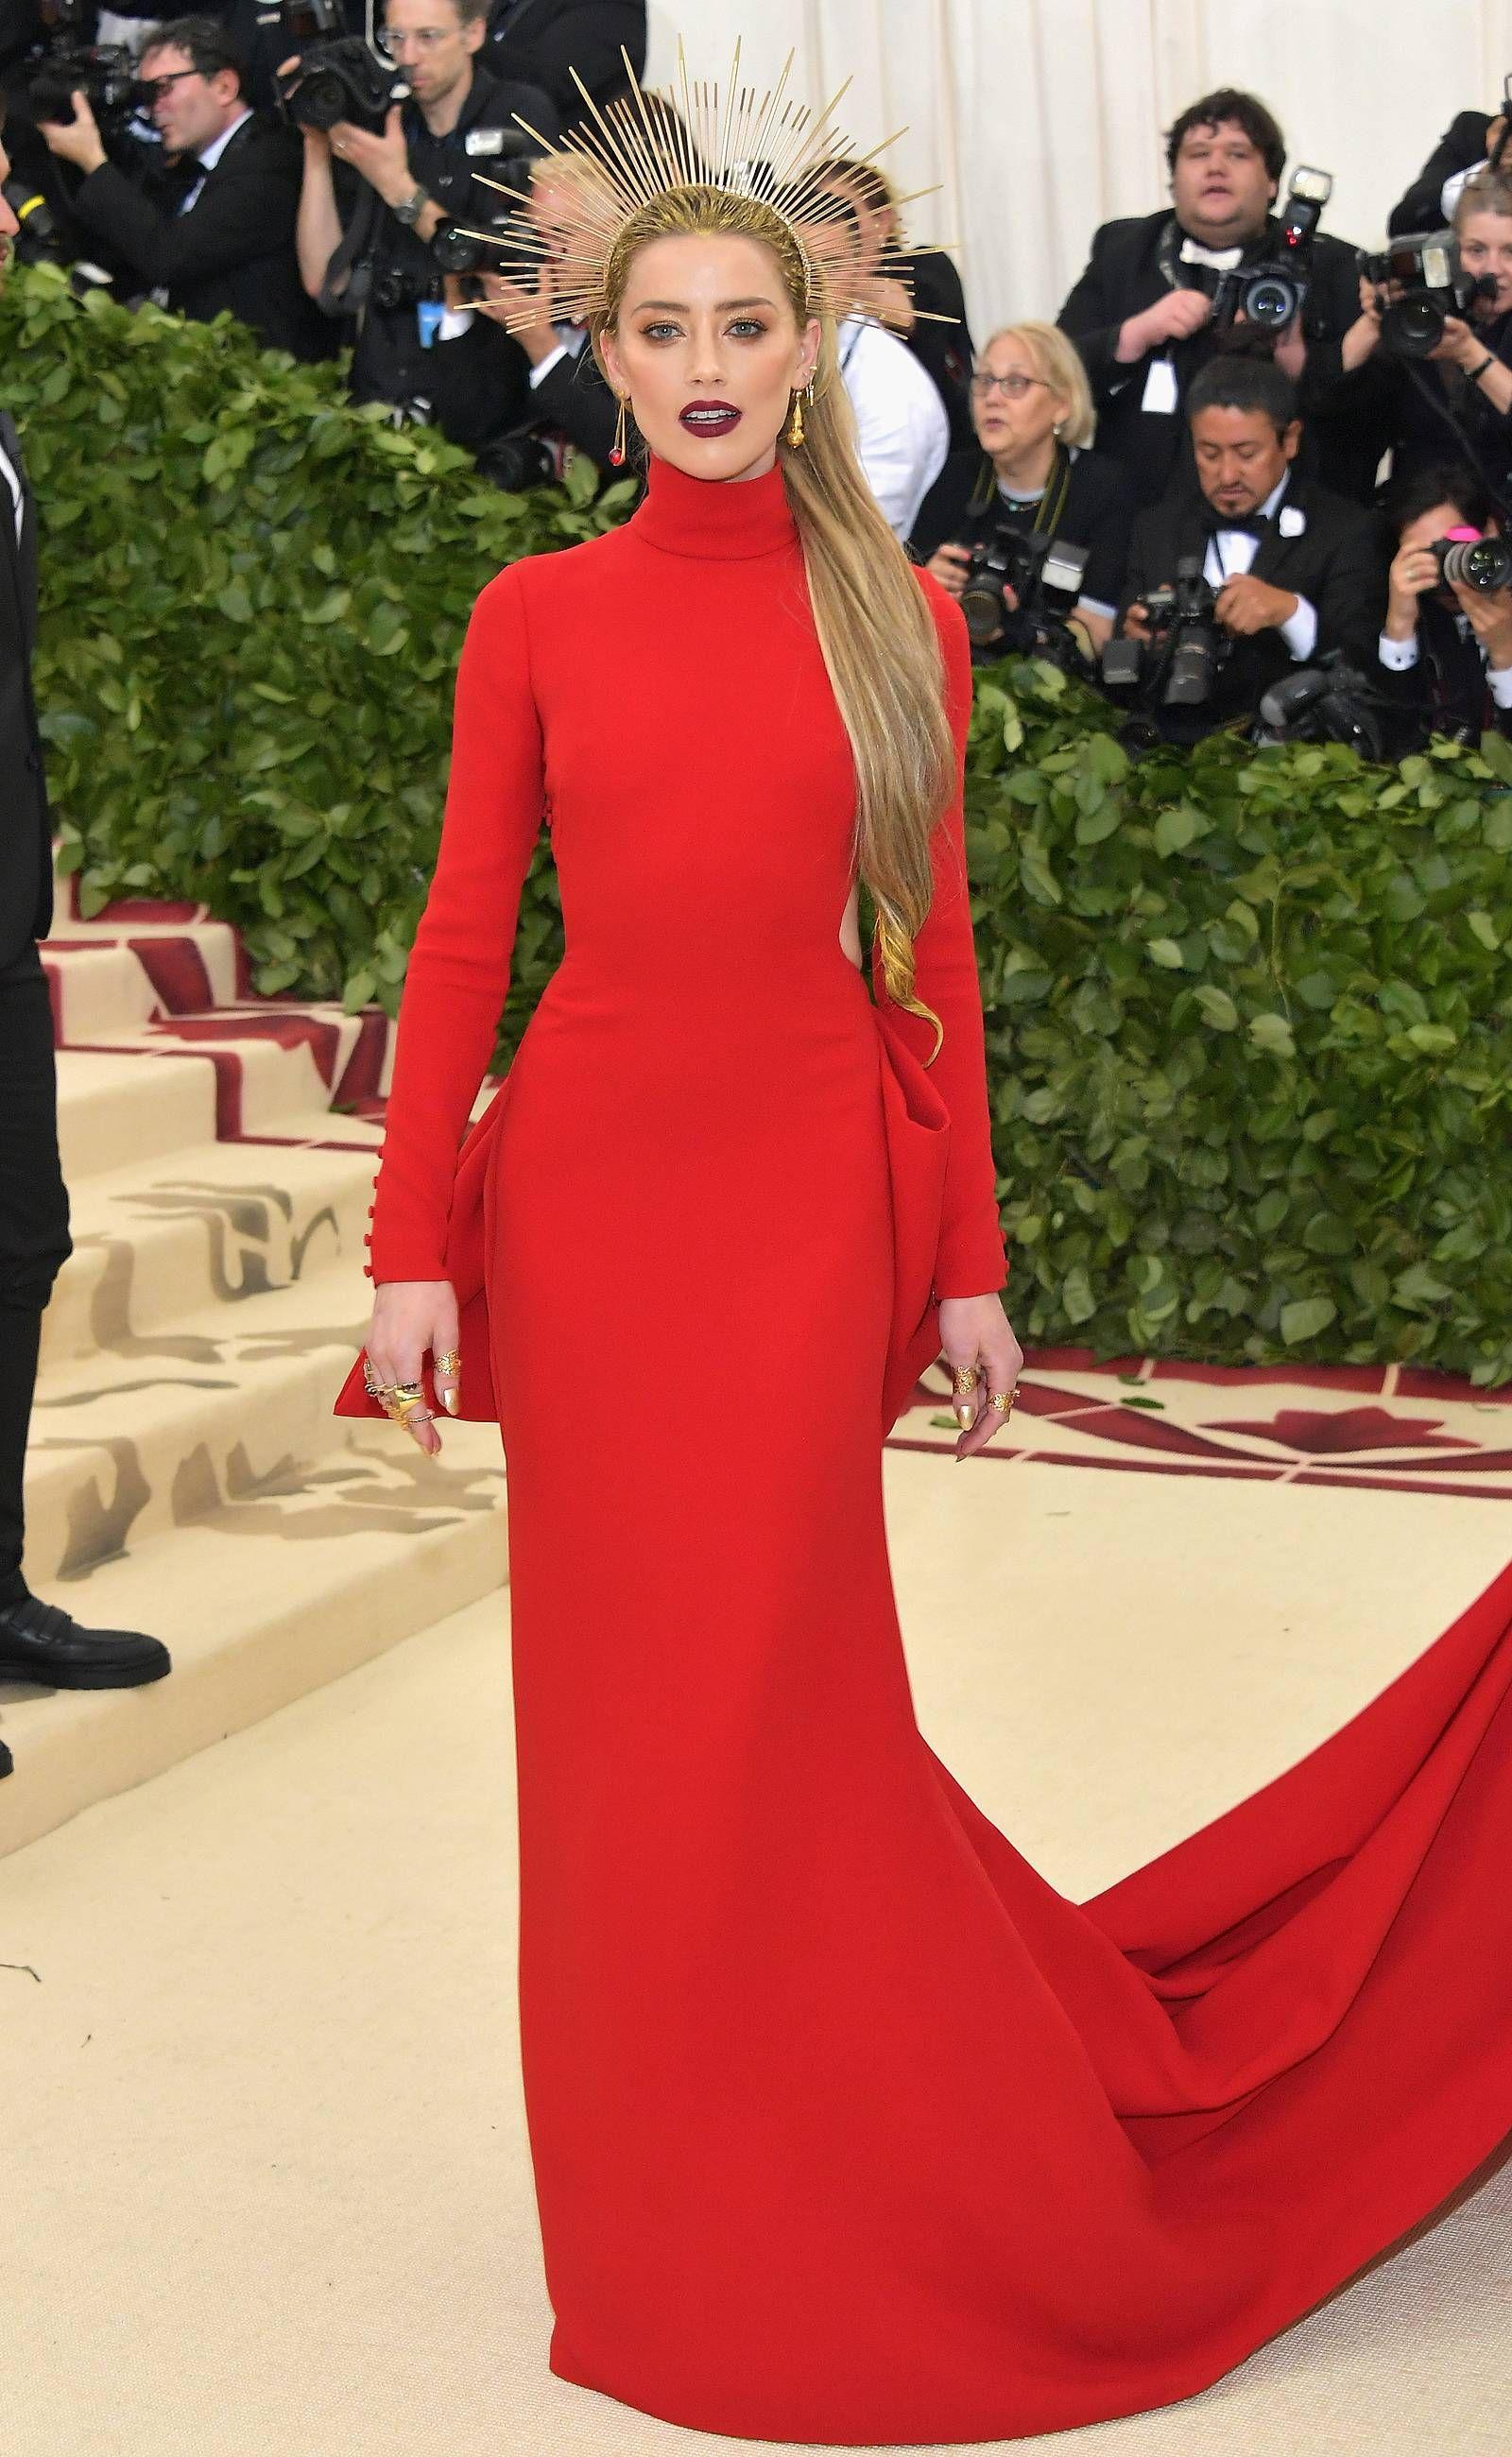 Tesla Ceo Elon Musk Is Dating Singer Grimes Months After Splitting From Amber Heard See Their Met Gala Debut Met Gala Looks Celebrity Dresses Red Carpet Nice Dresses